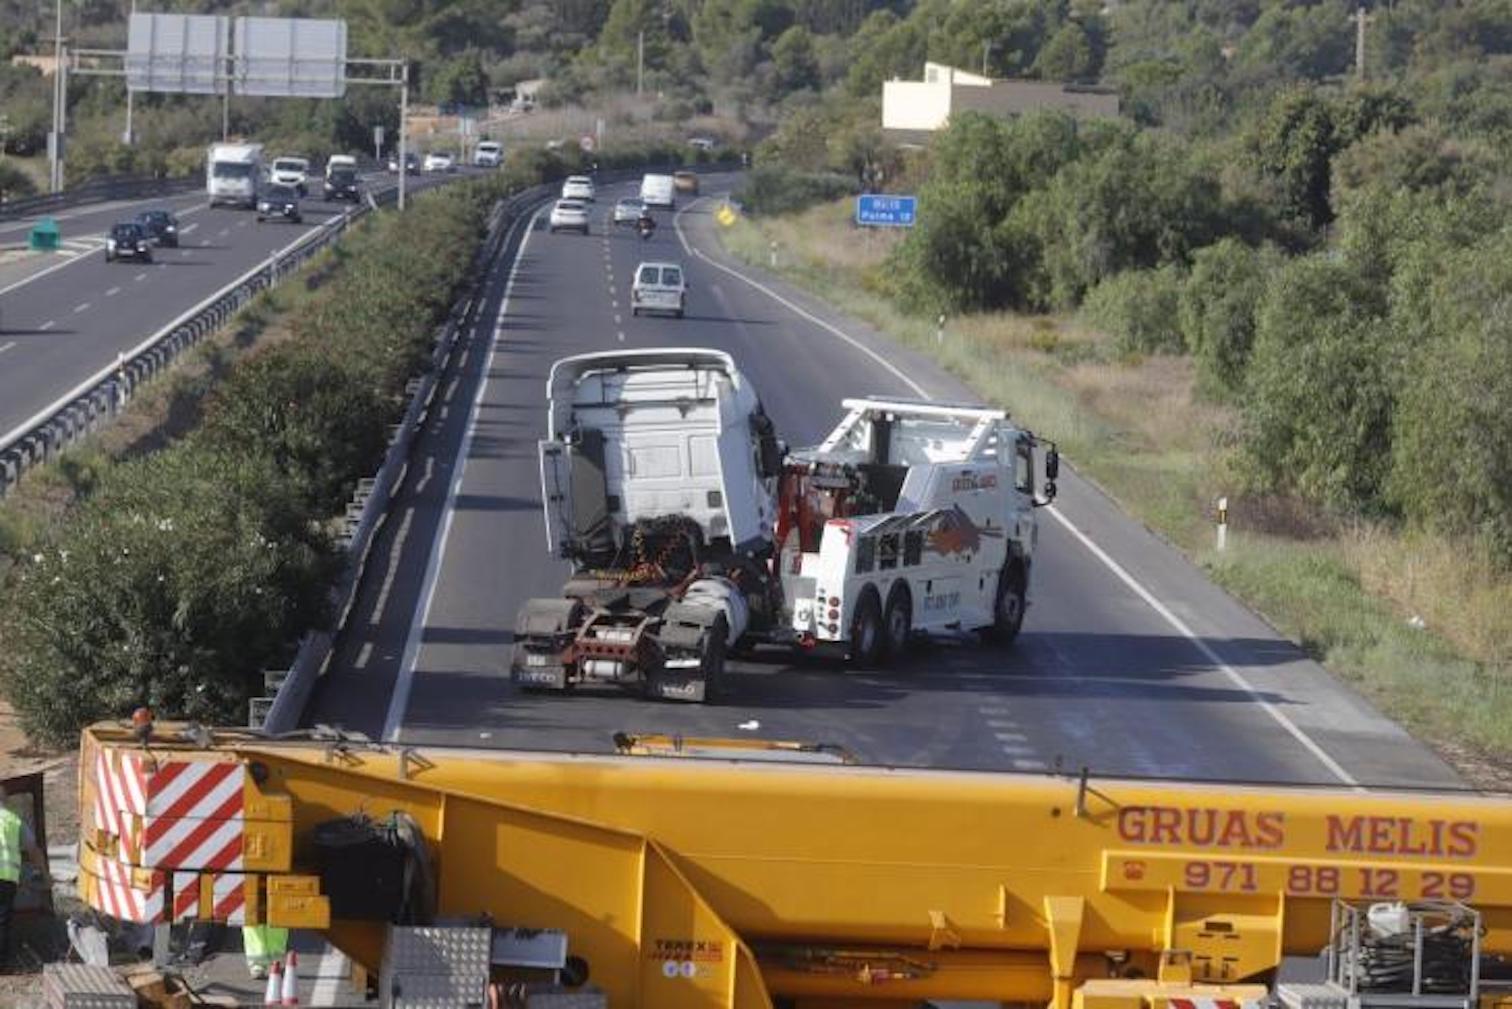 Crane on Ma-13, Mallorca.